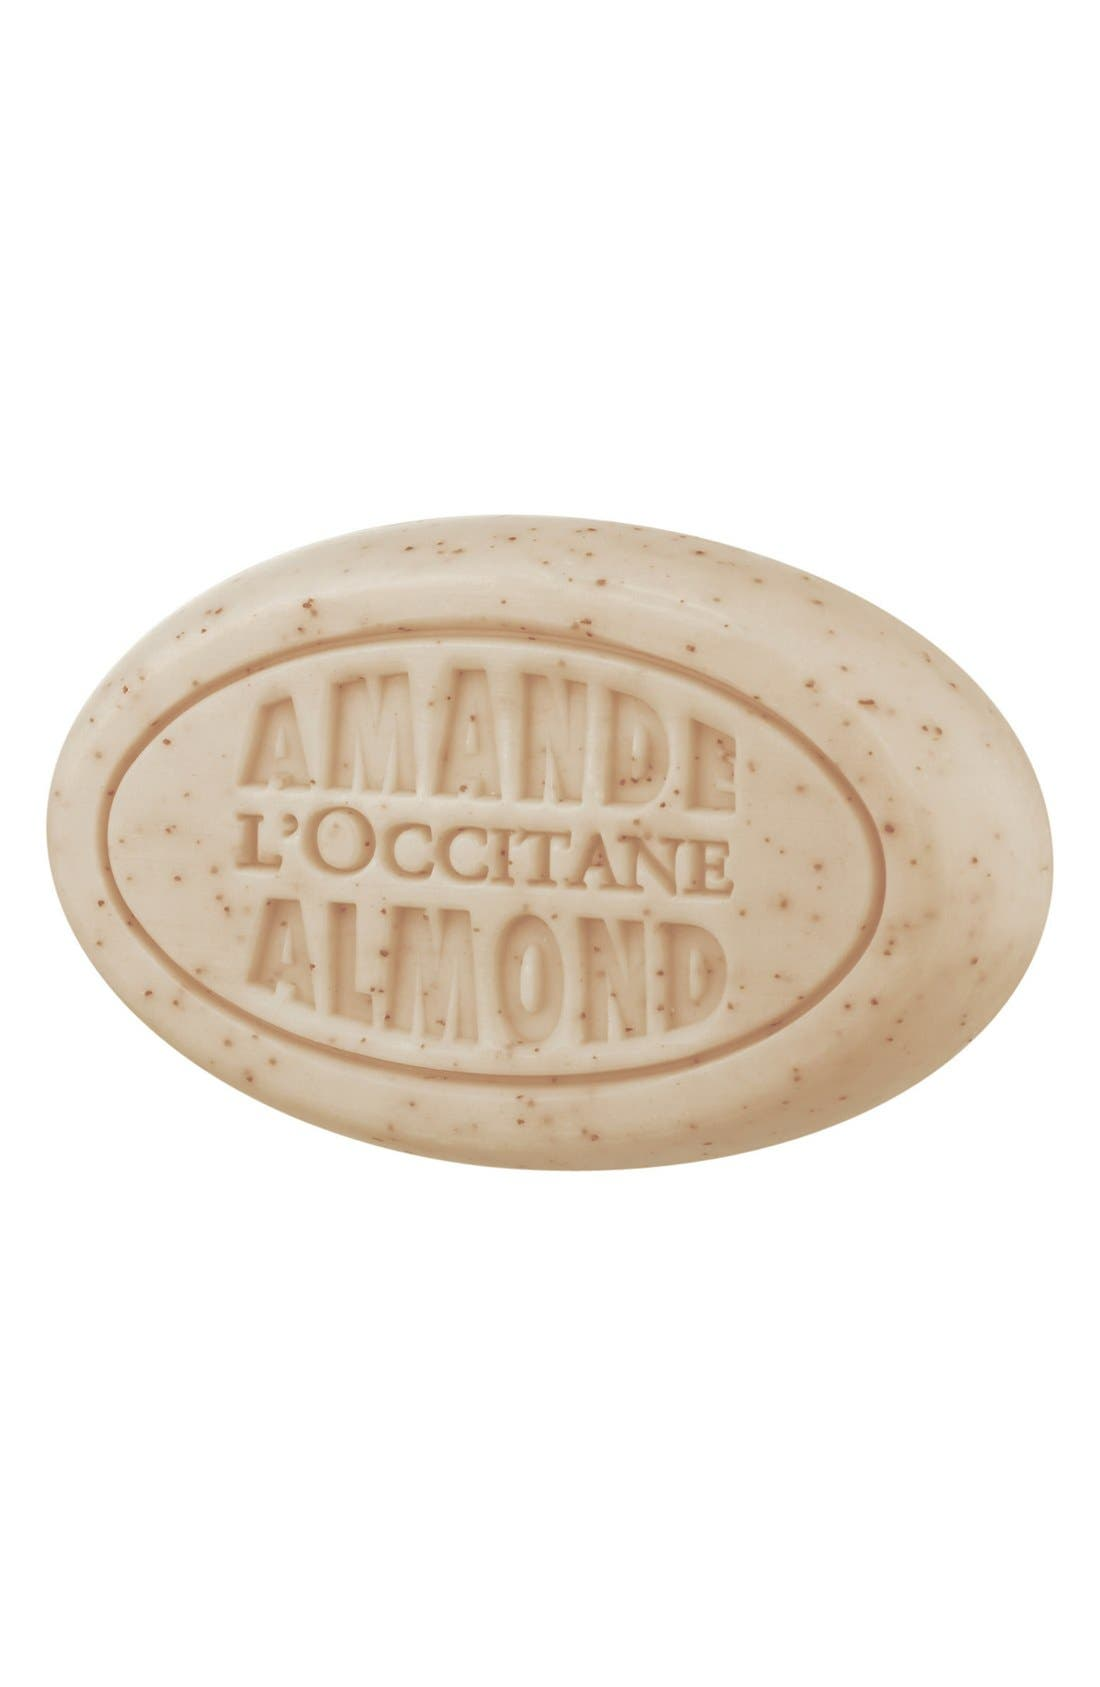 L'OCCITANE, Almond Delicious Soap, Main thumbnail 1, color, NO COLOR